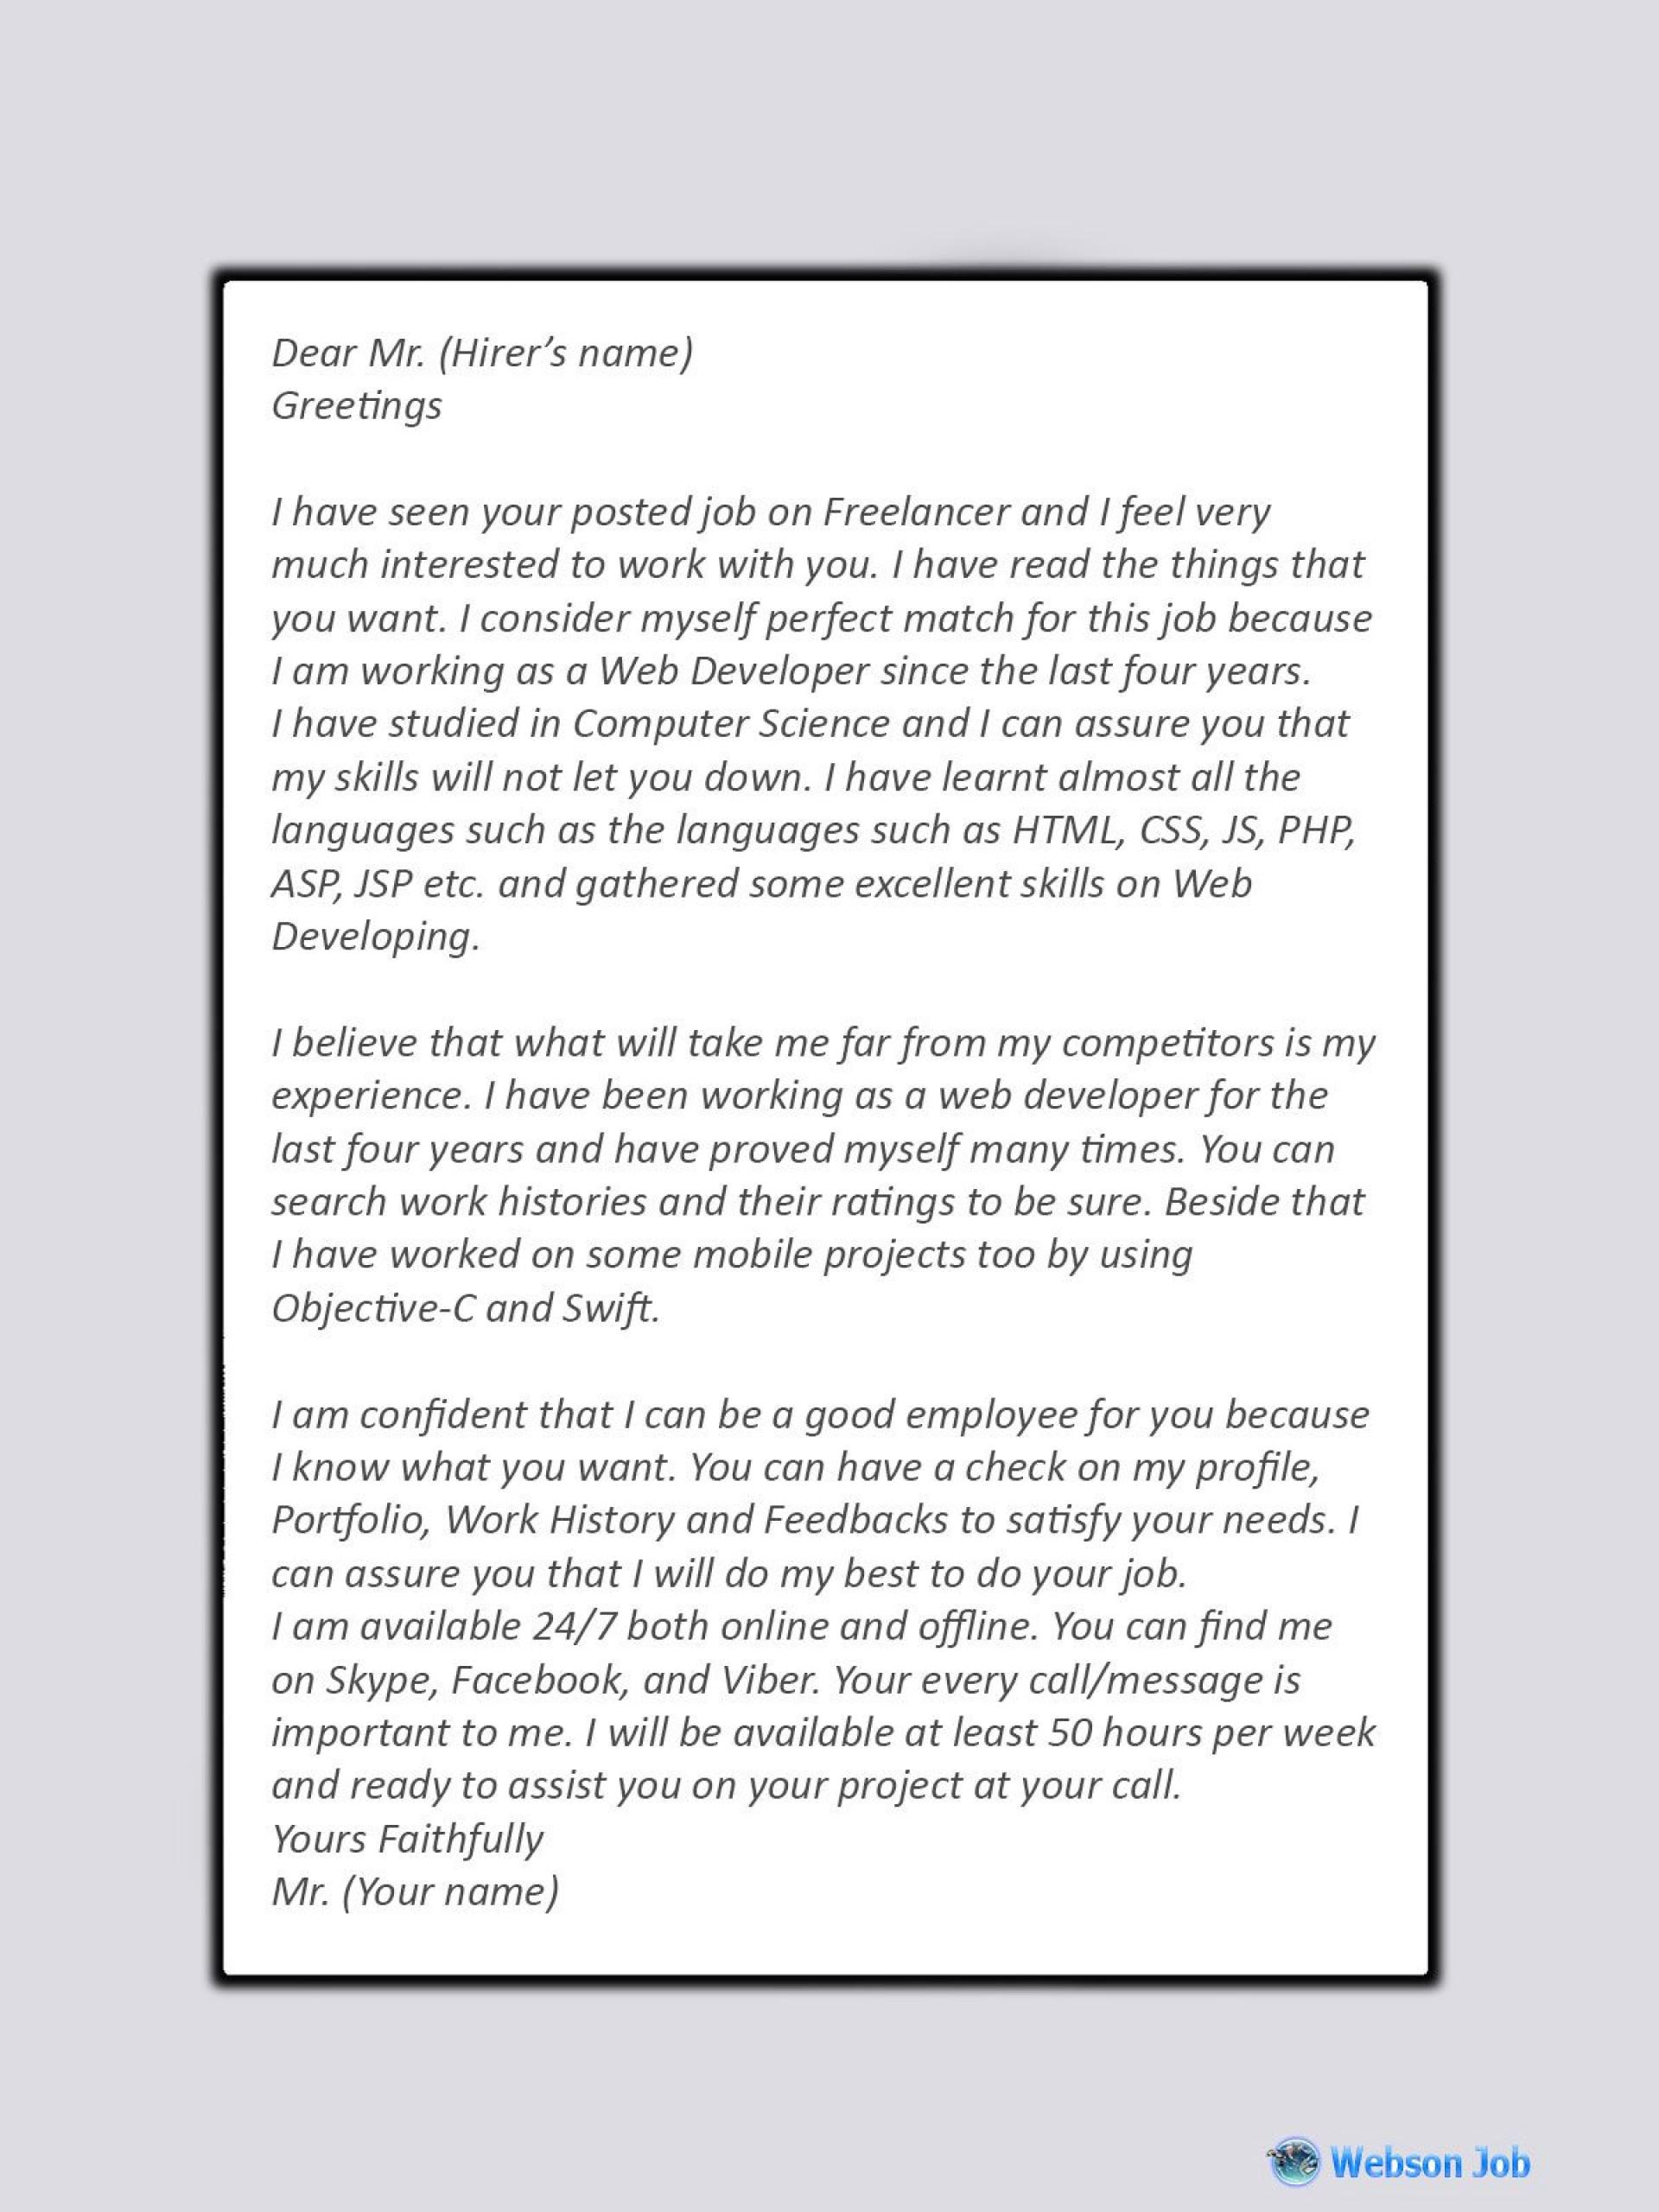 009 Phenomenal Freelance Web Developer Proposal Template Highest Clarity 1920